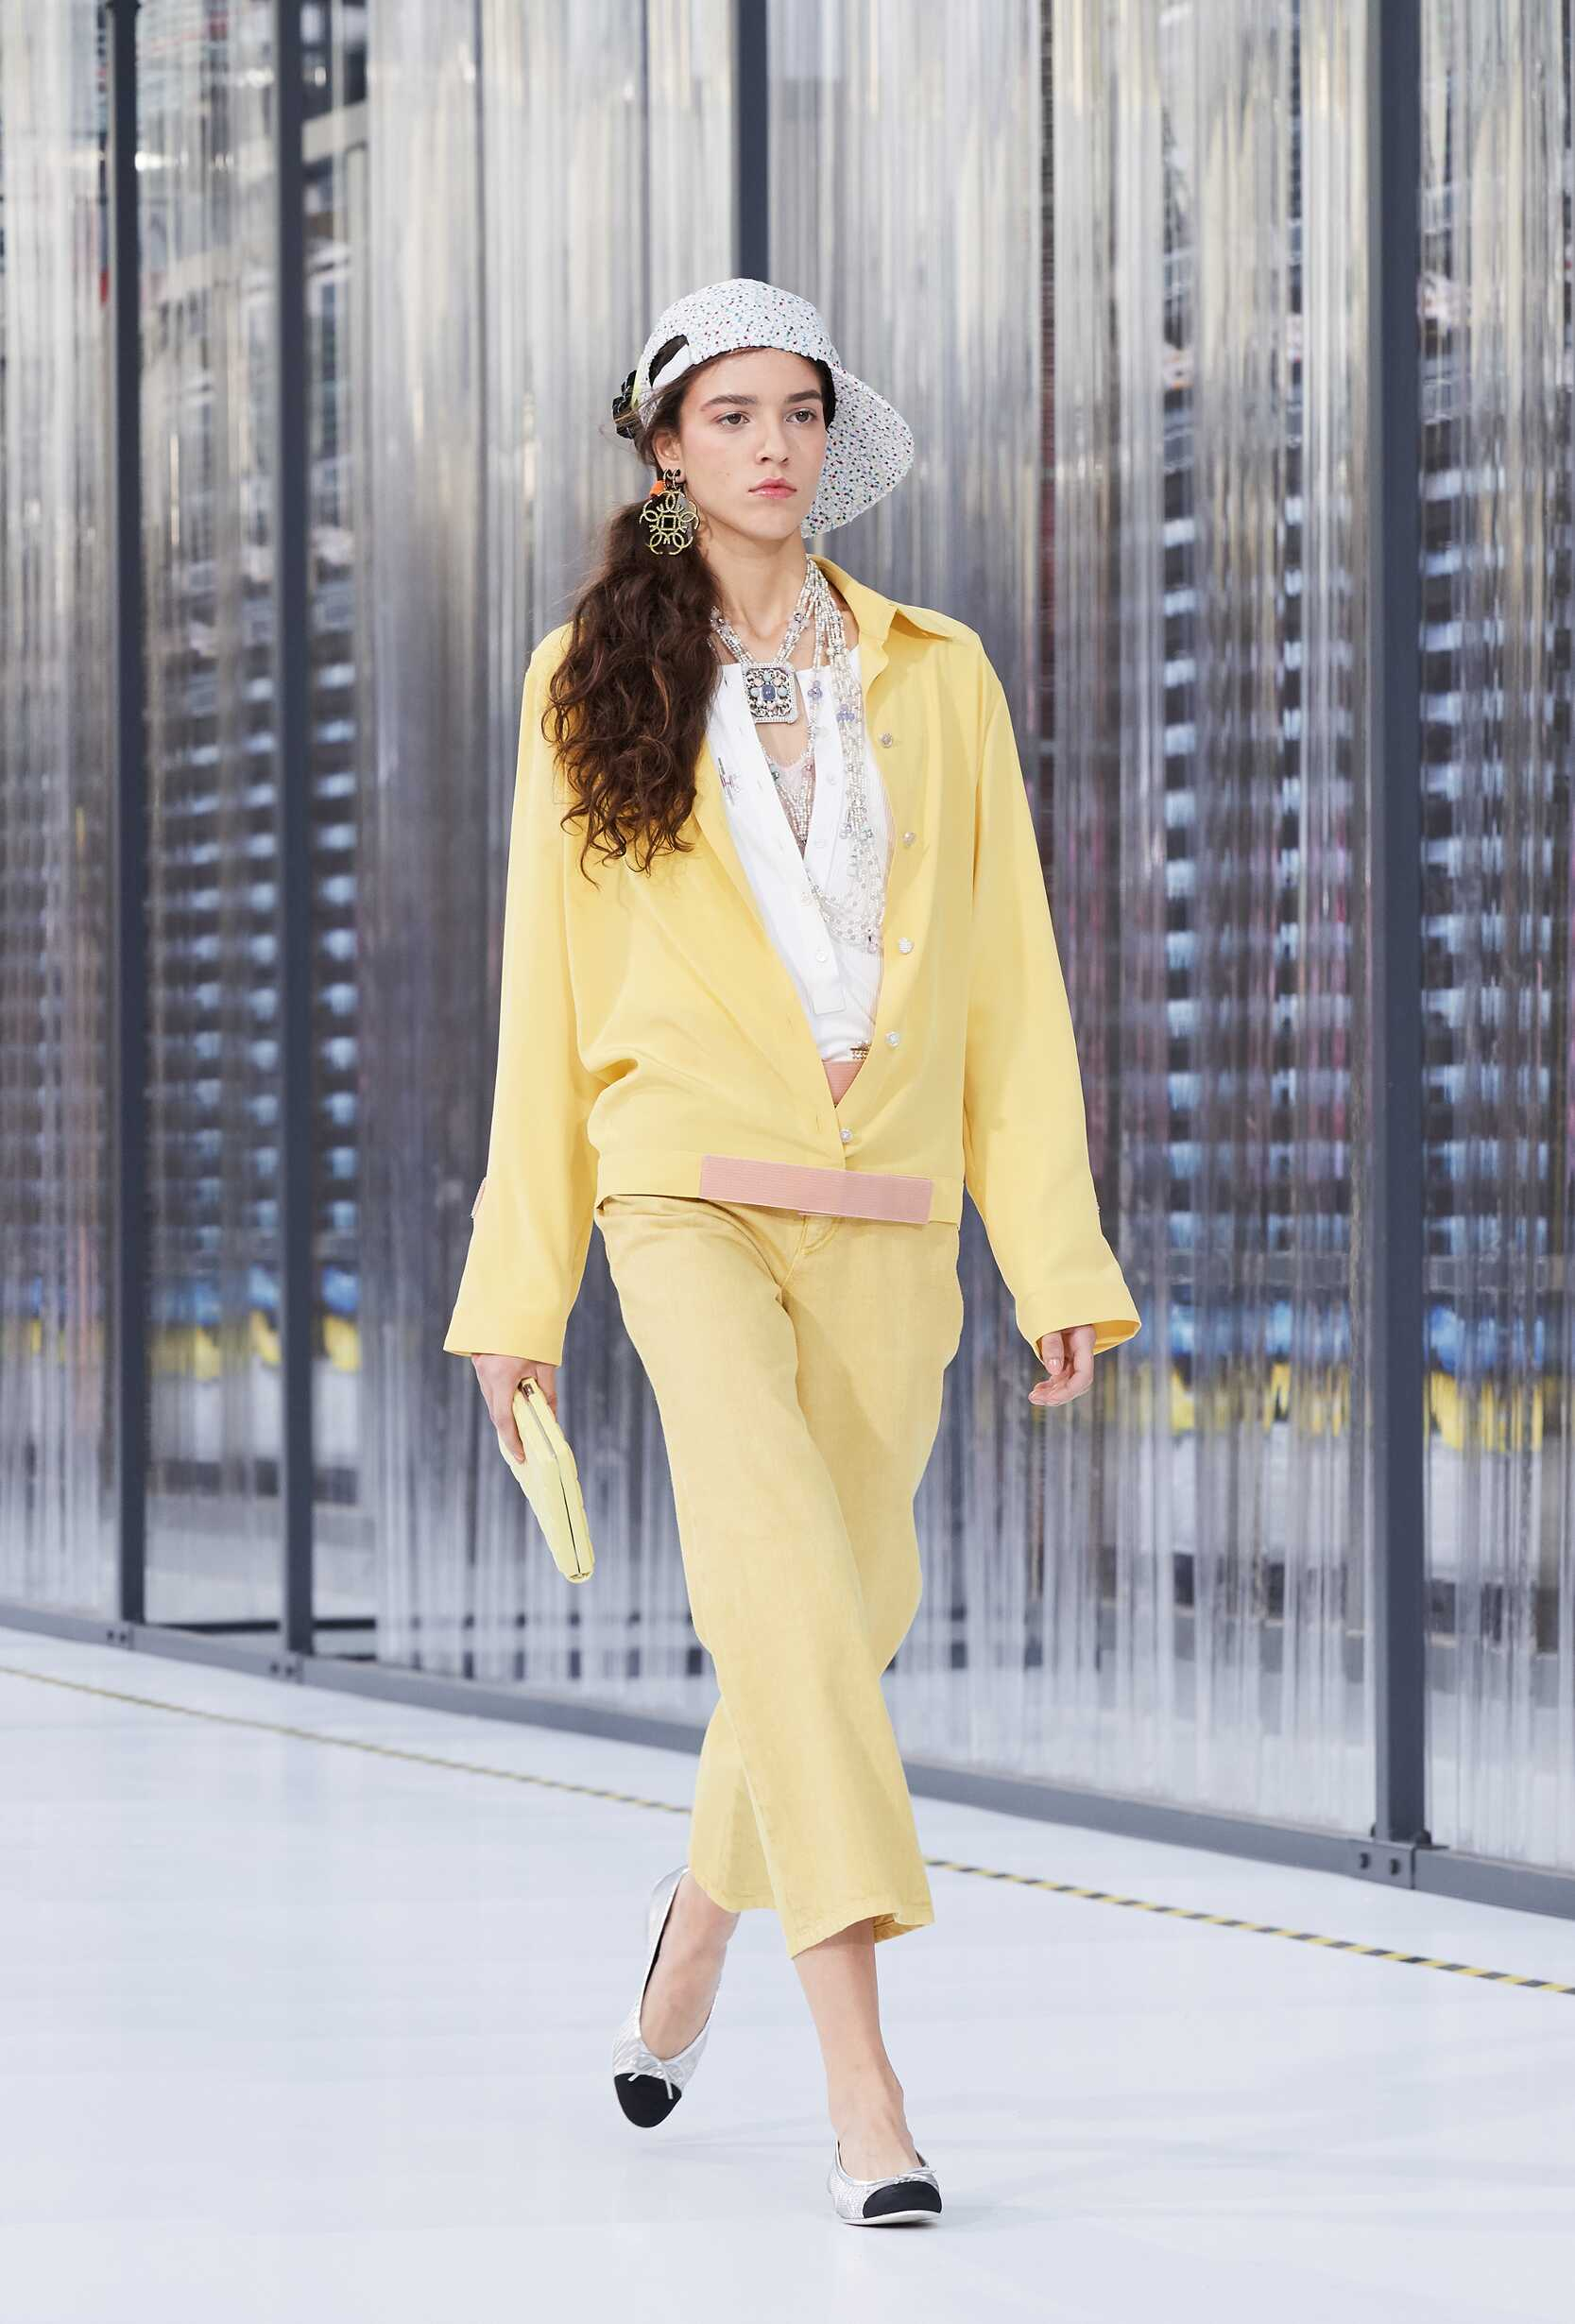 2017 Catwalk Chanel Woman Fashion Show Summer